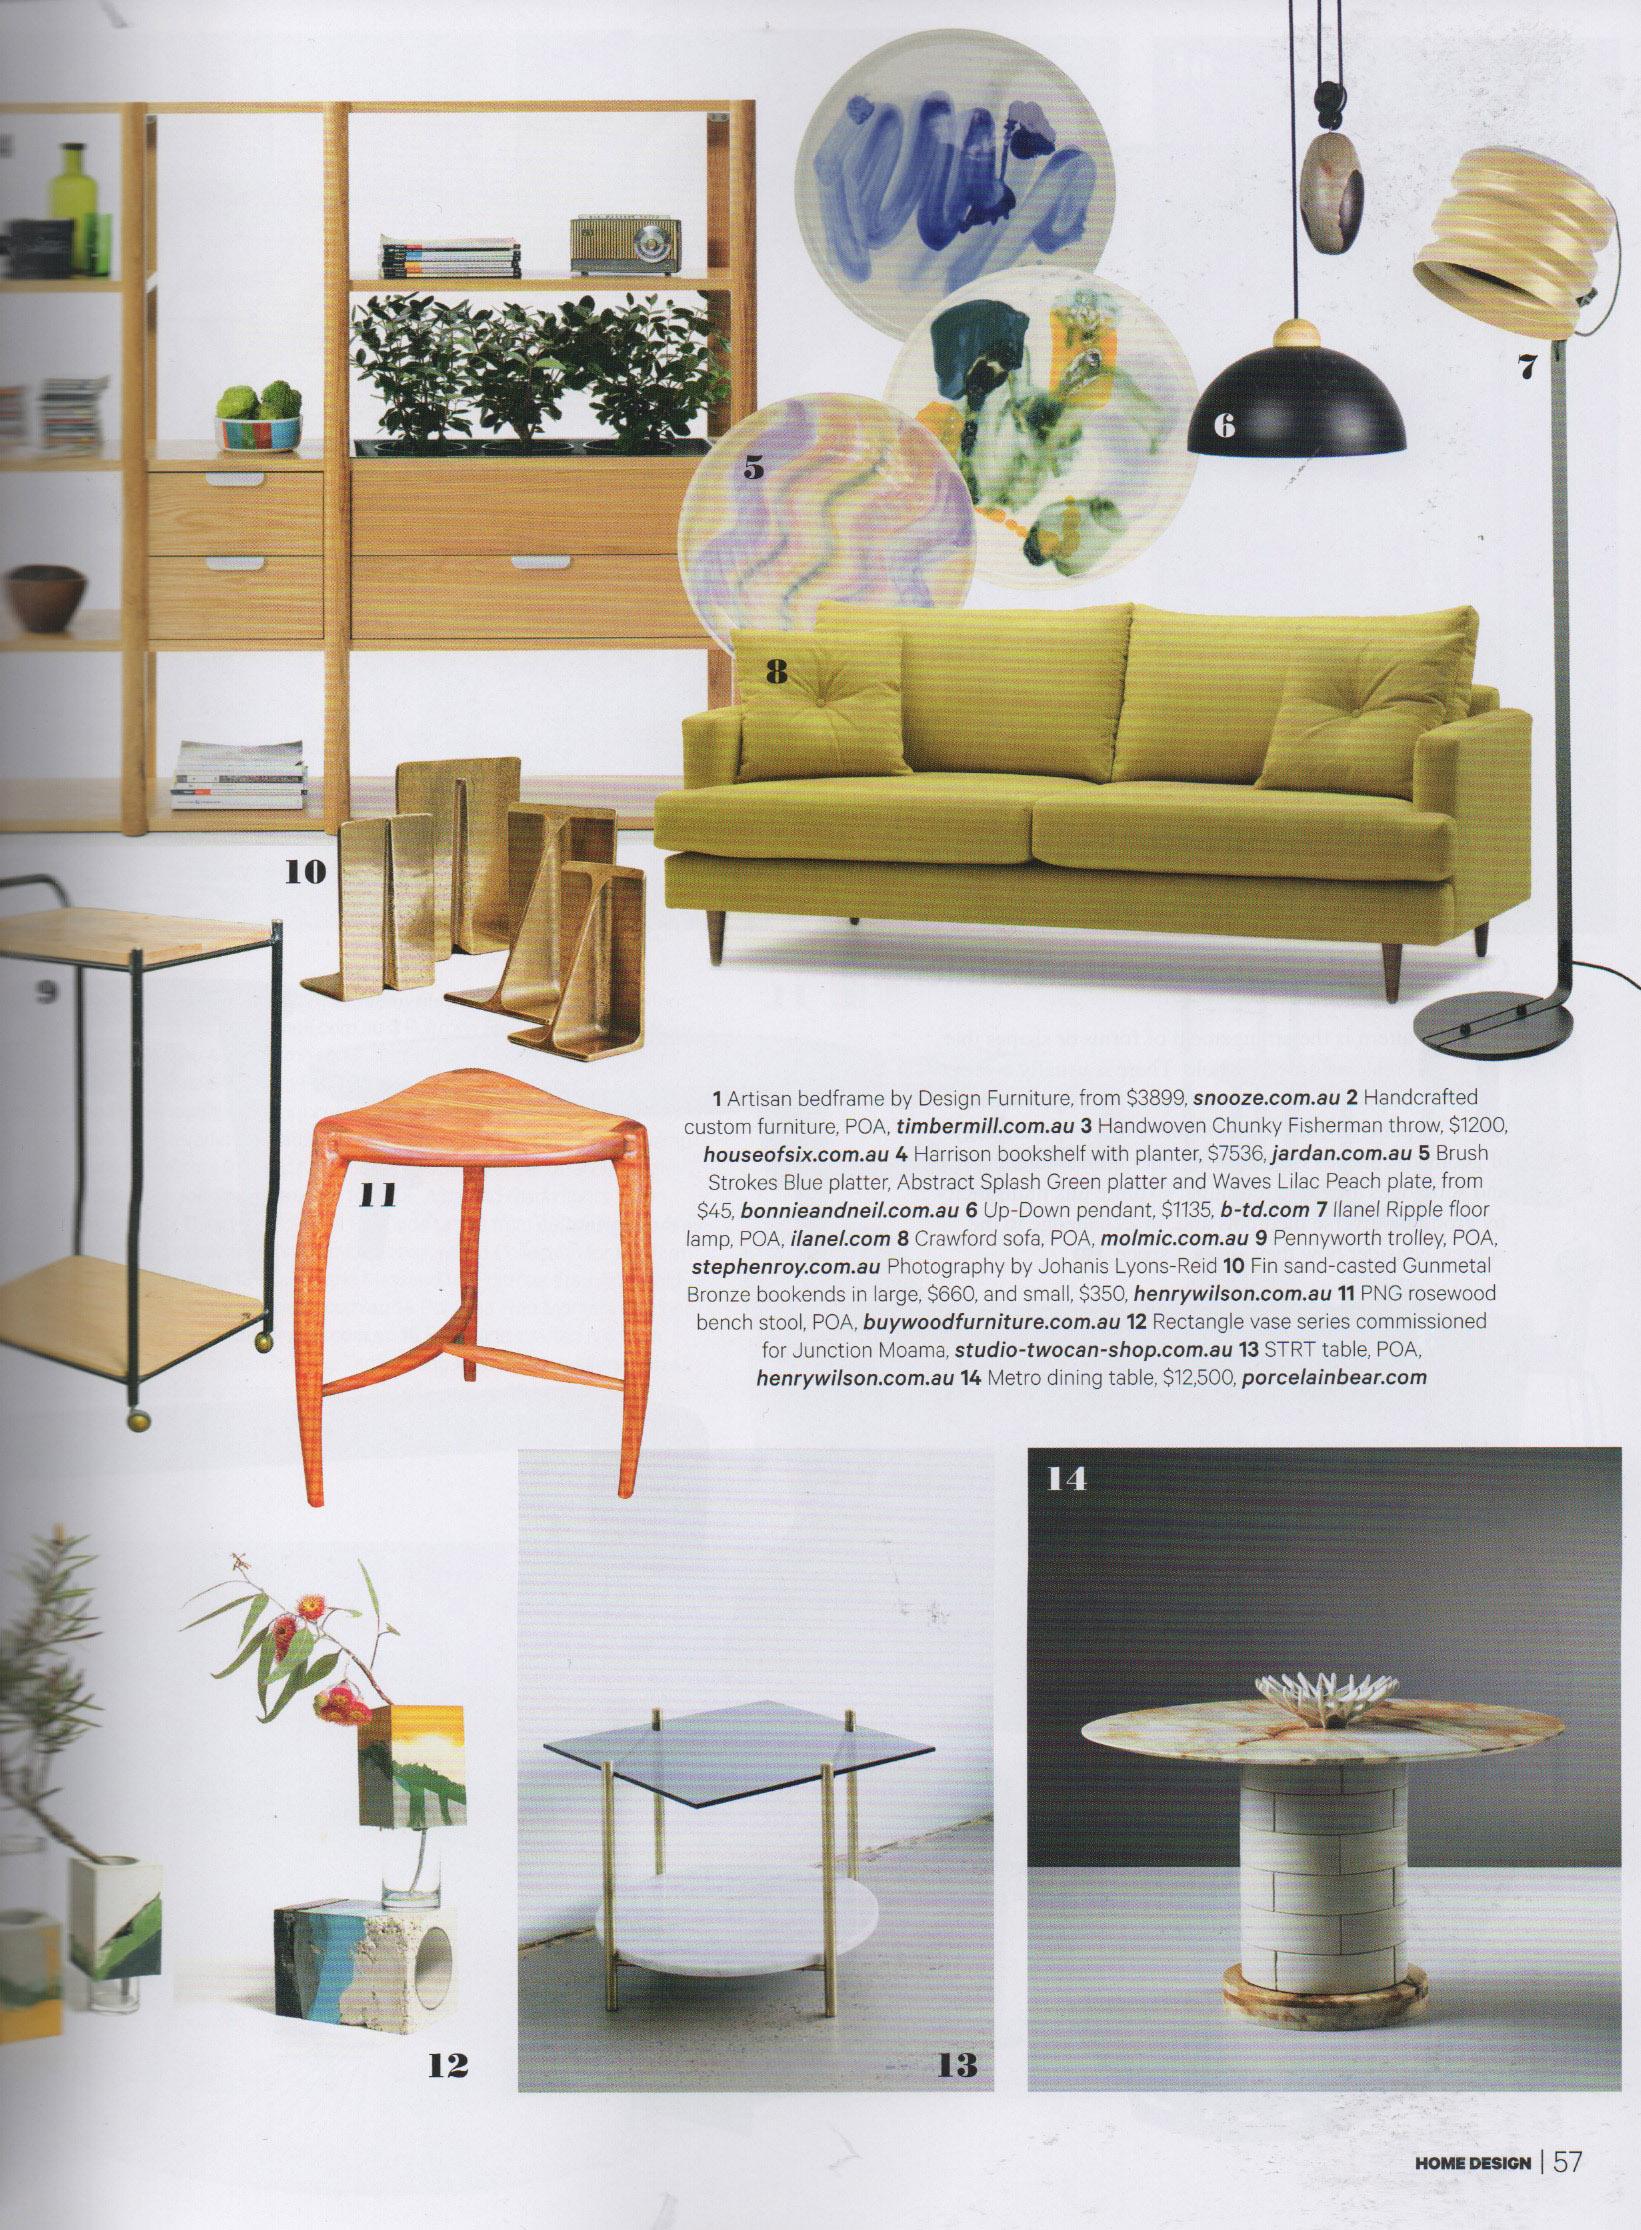 ilanel - Home Design - Vol 19 No 5 - pg 57.jpg